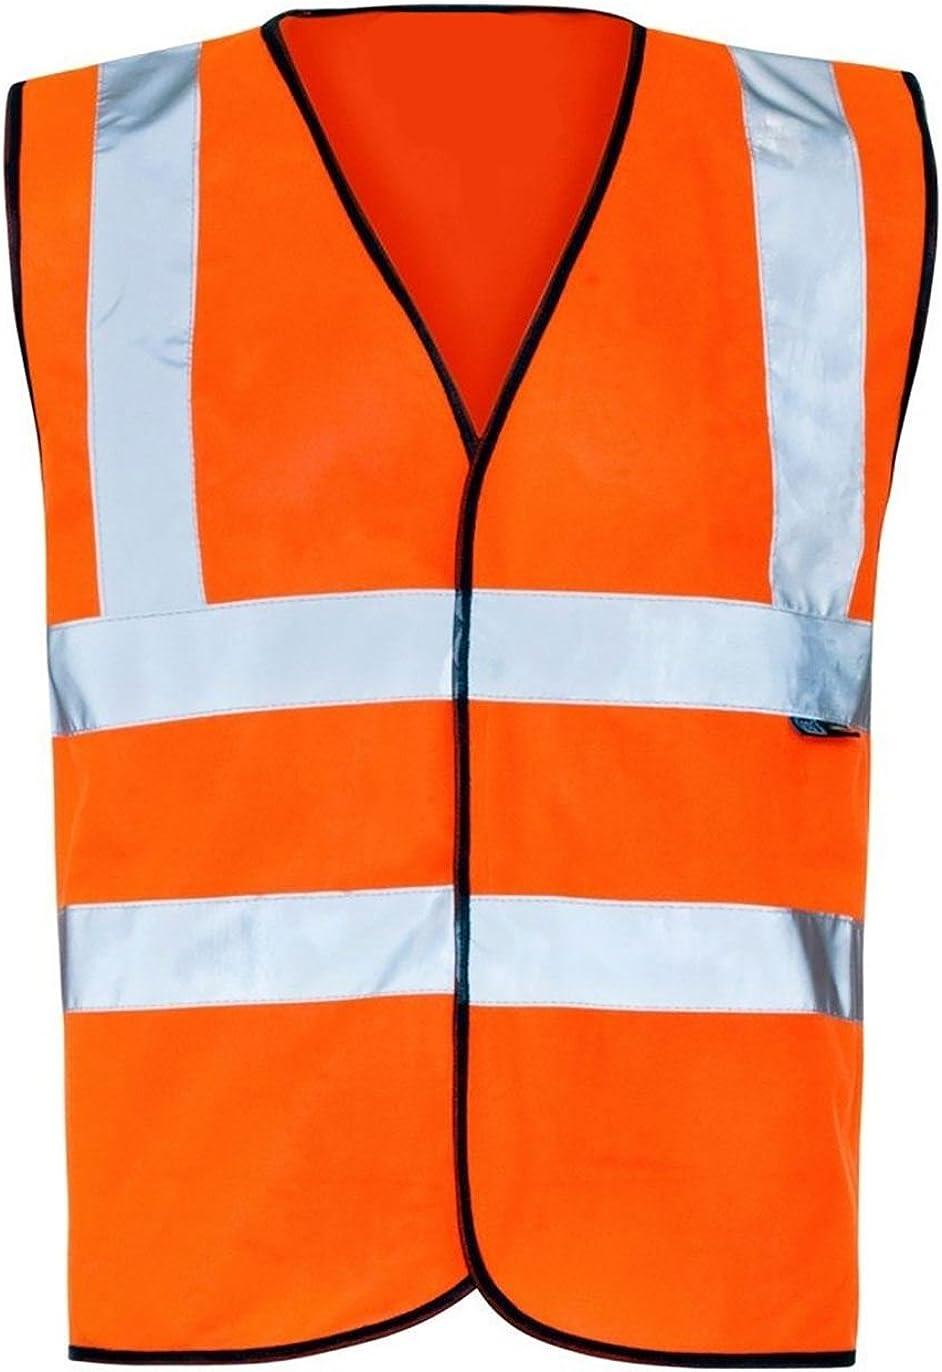 My Choice Stuff Adults Zip Fastening Hi Visibility Sleeveless Vest Mens Sportswear Supplies Vest Small-4XLarge